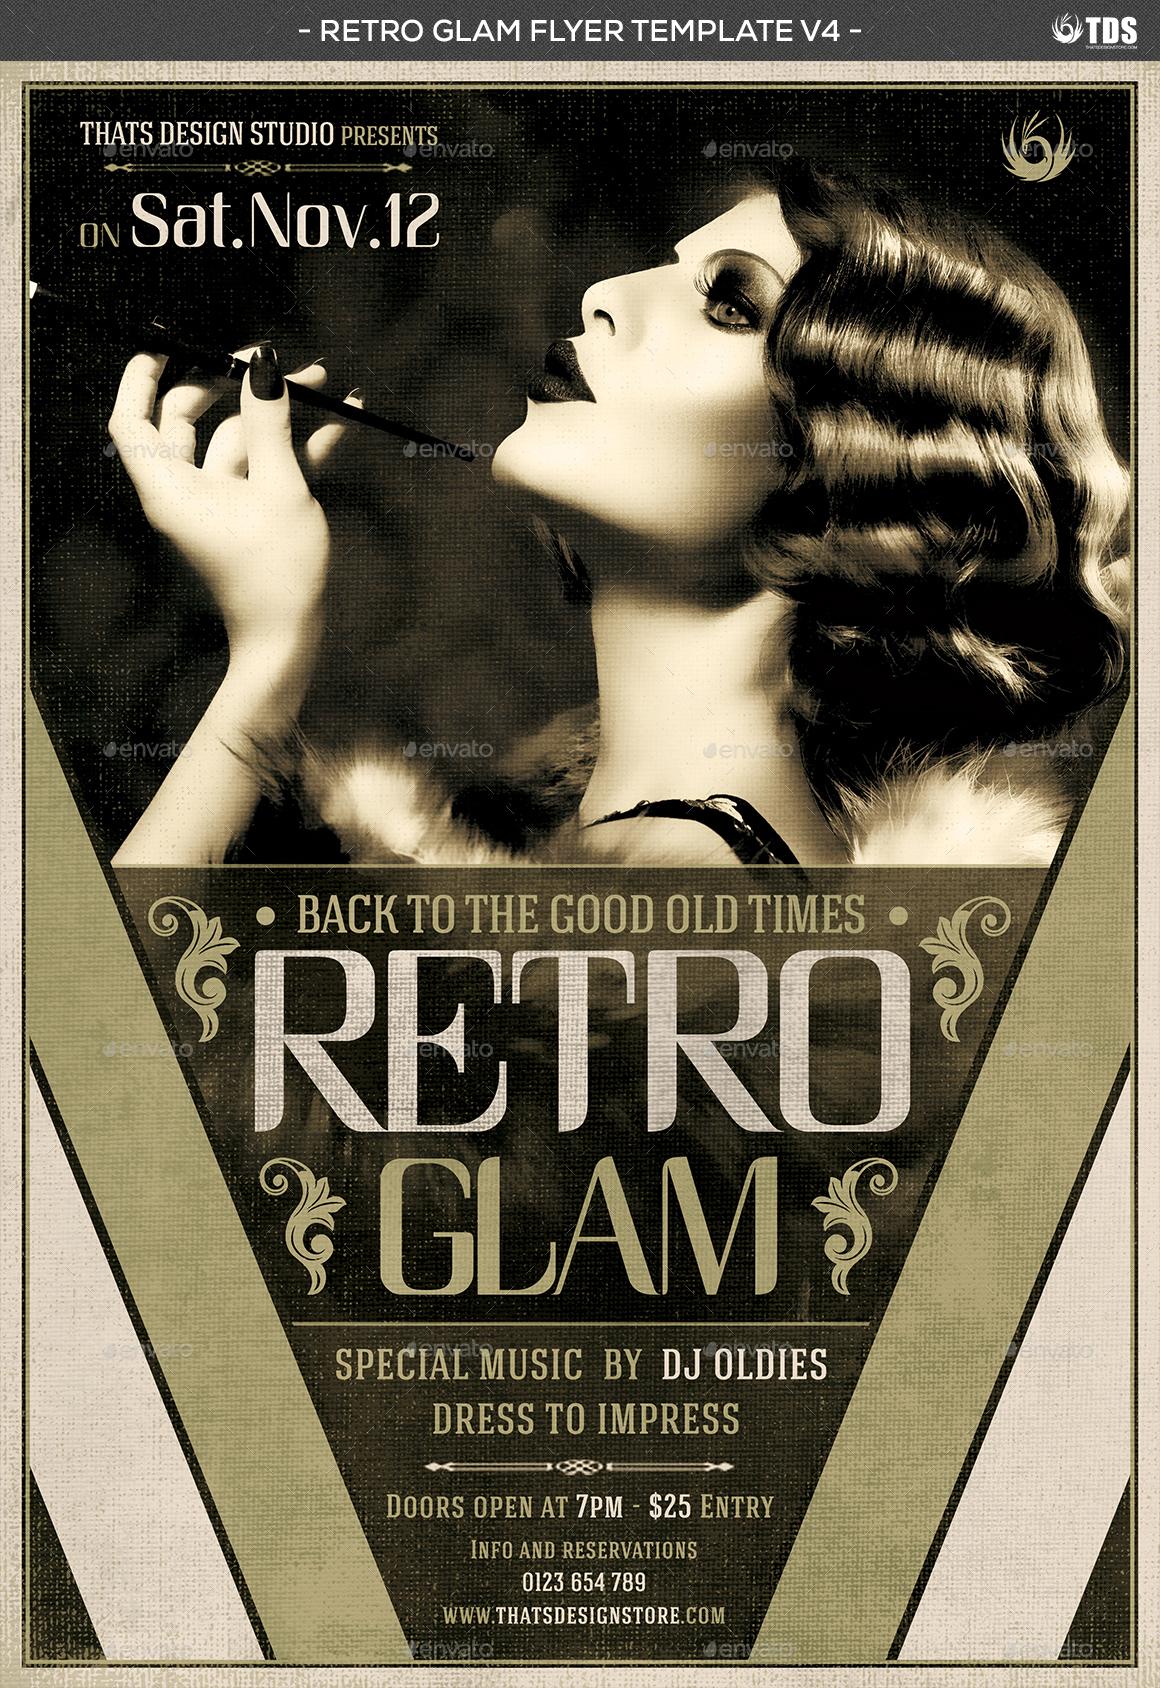 Retro Glam Flyer Template V4 by lou606 – Retro Flyer Template